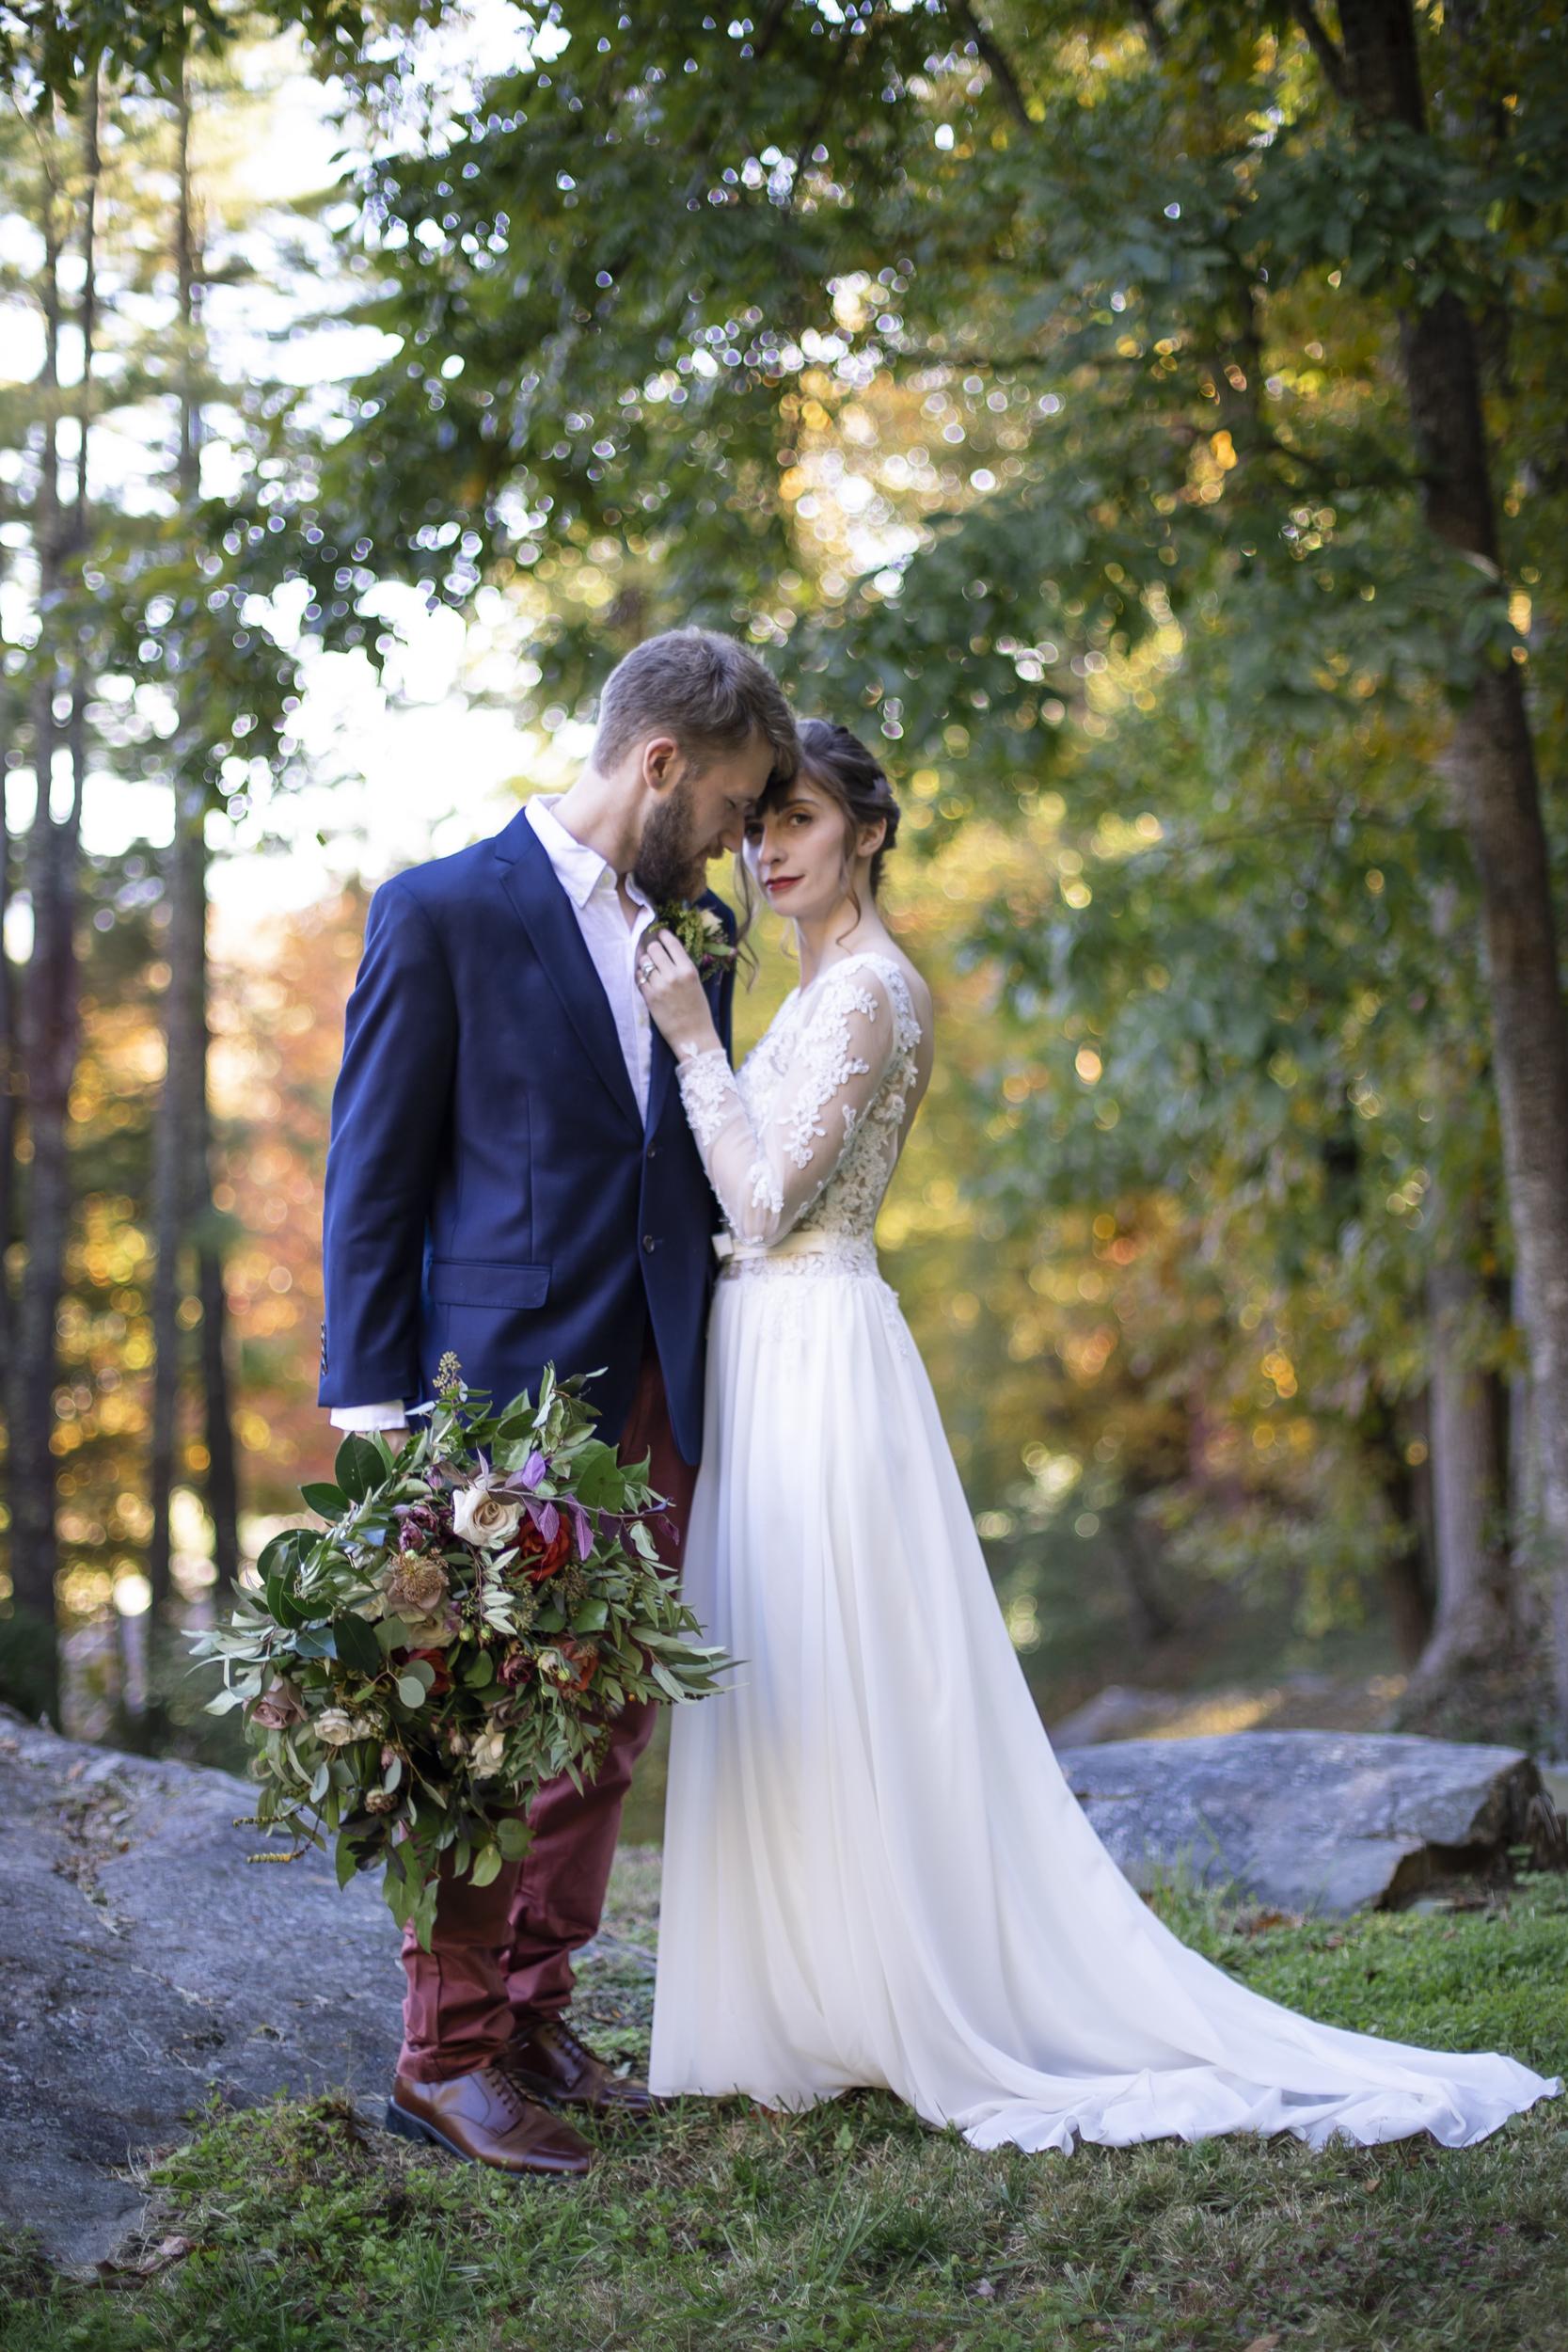 Laurel Falls Wedding October 2018_Allison and Josh__Lola Salon_Flora_Photo by Studio Misha Photography-35.jpg